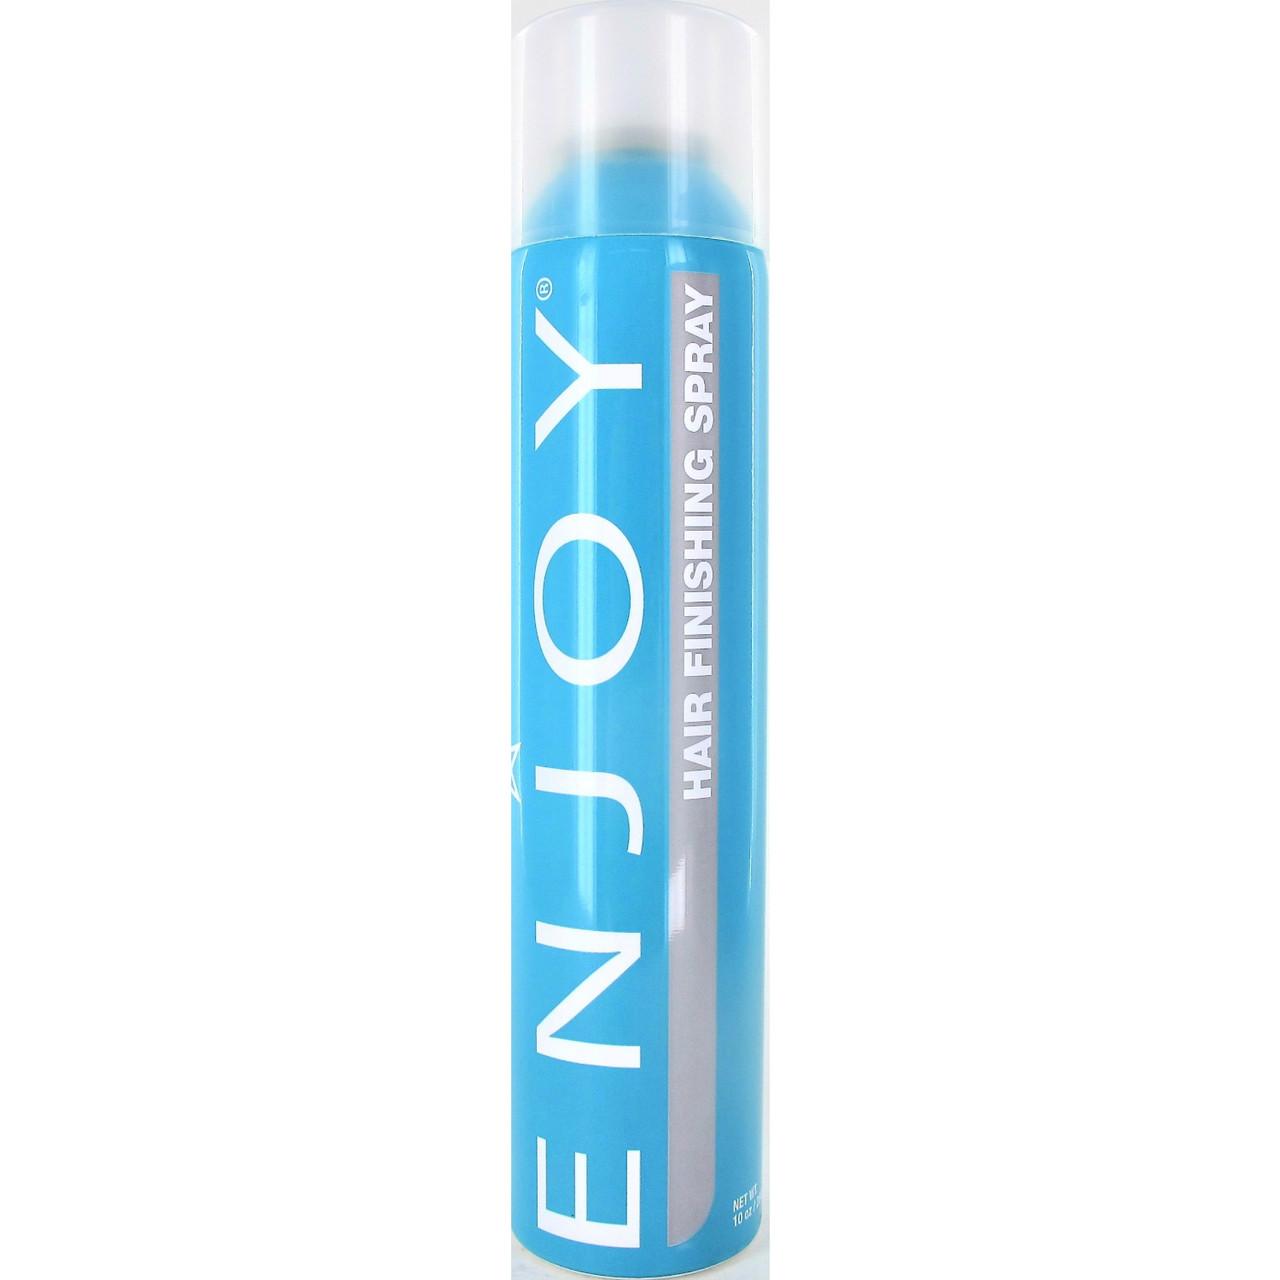 Enjoy Hair Finishing Spray